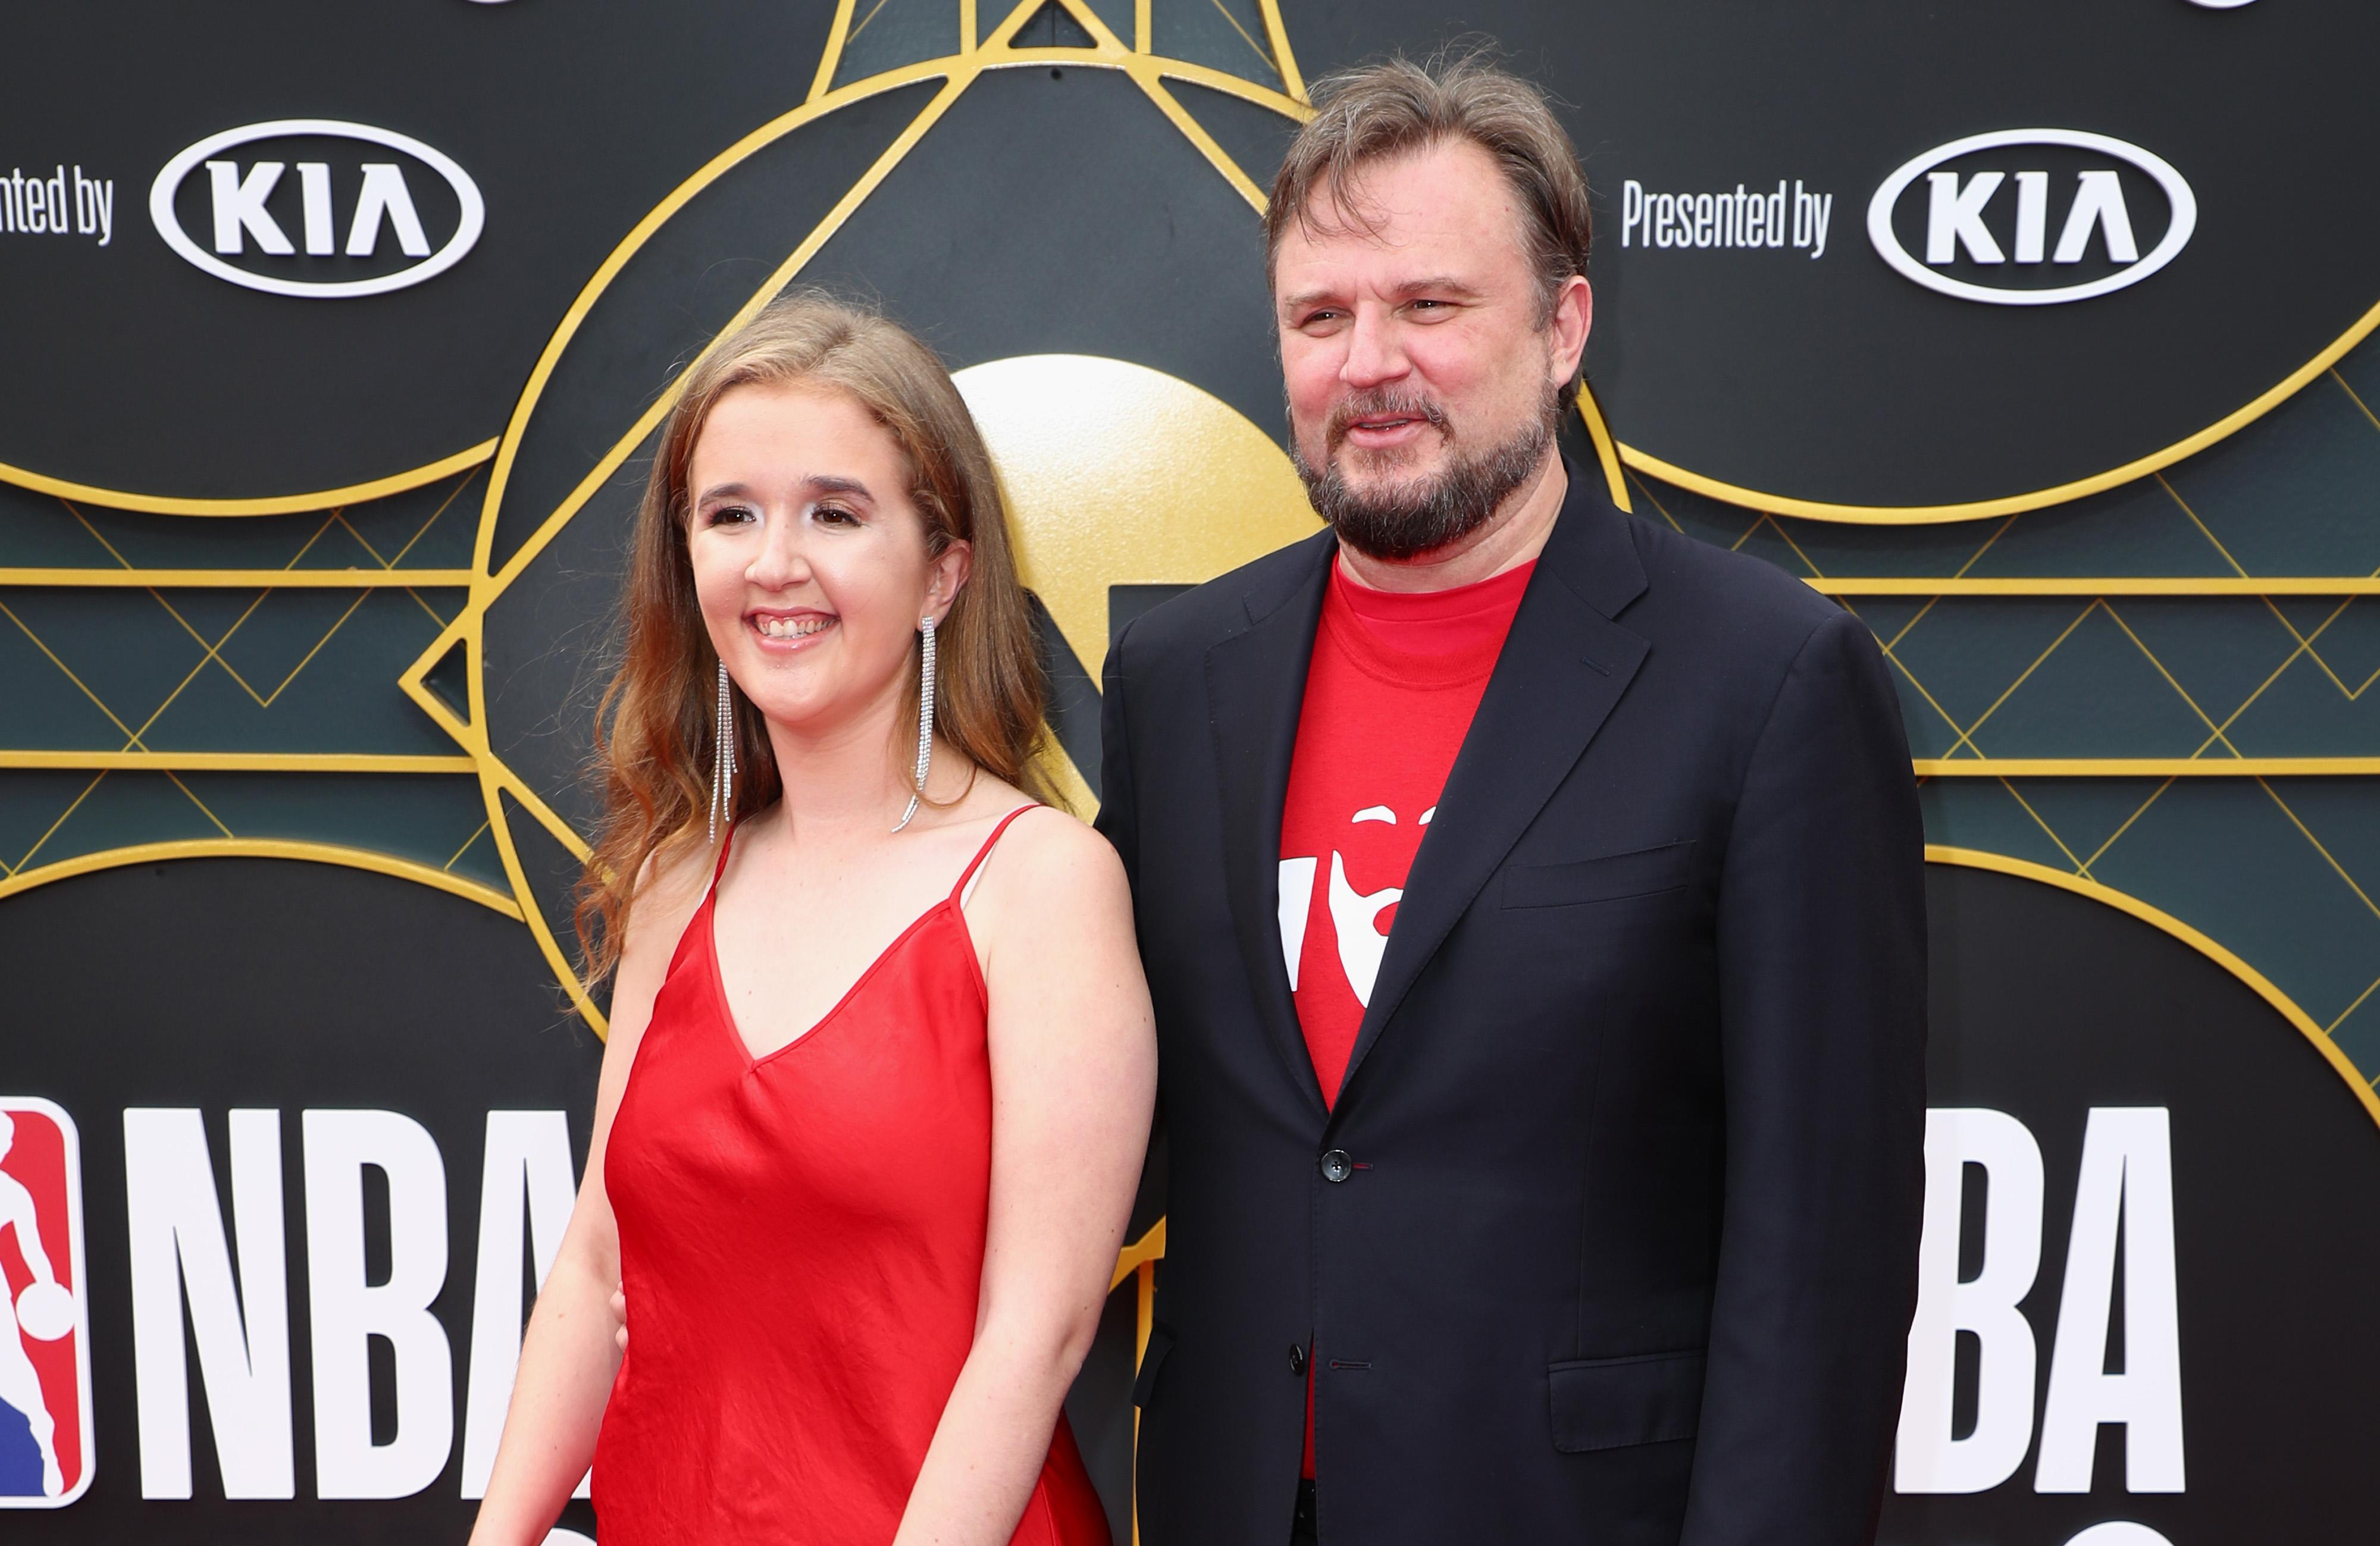 Ellen Morey and Daryl Morey attend the 2019 NBA Awards